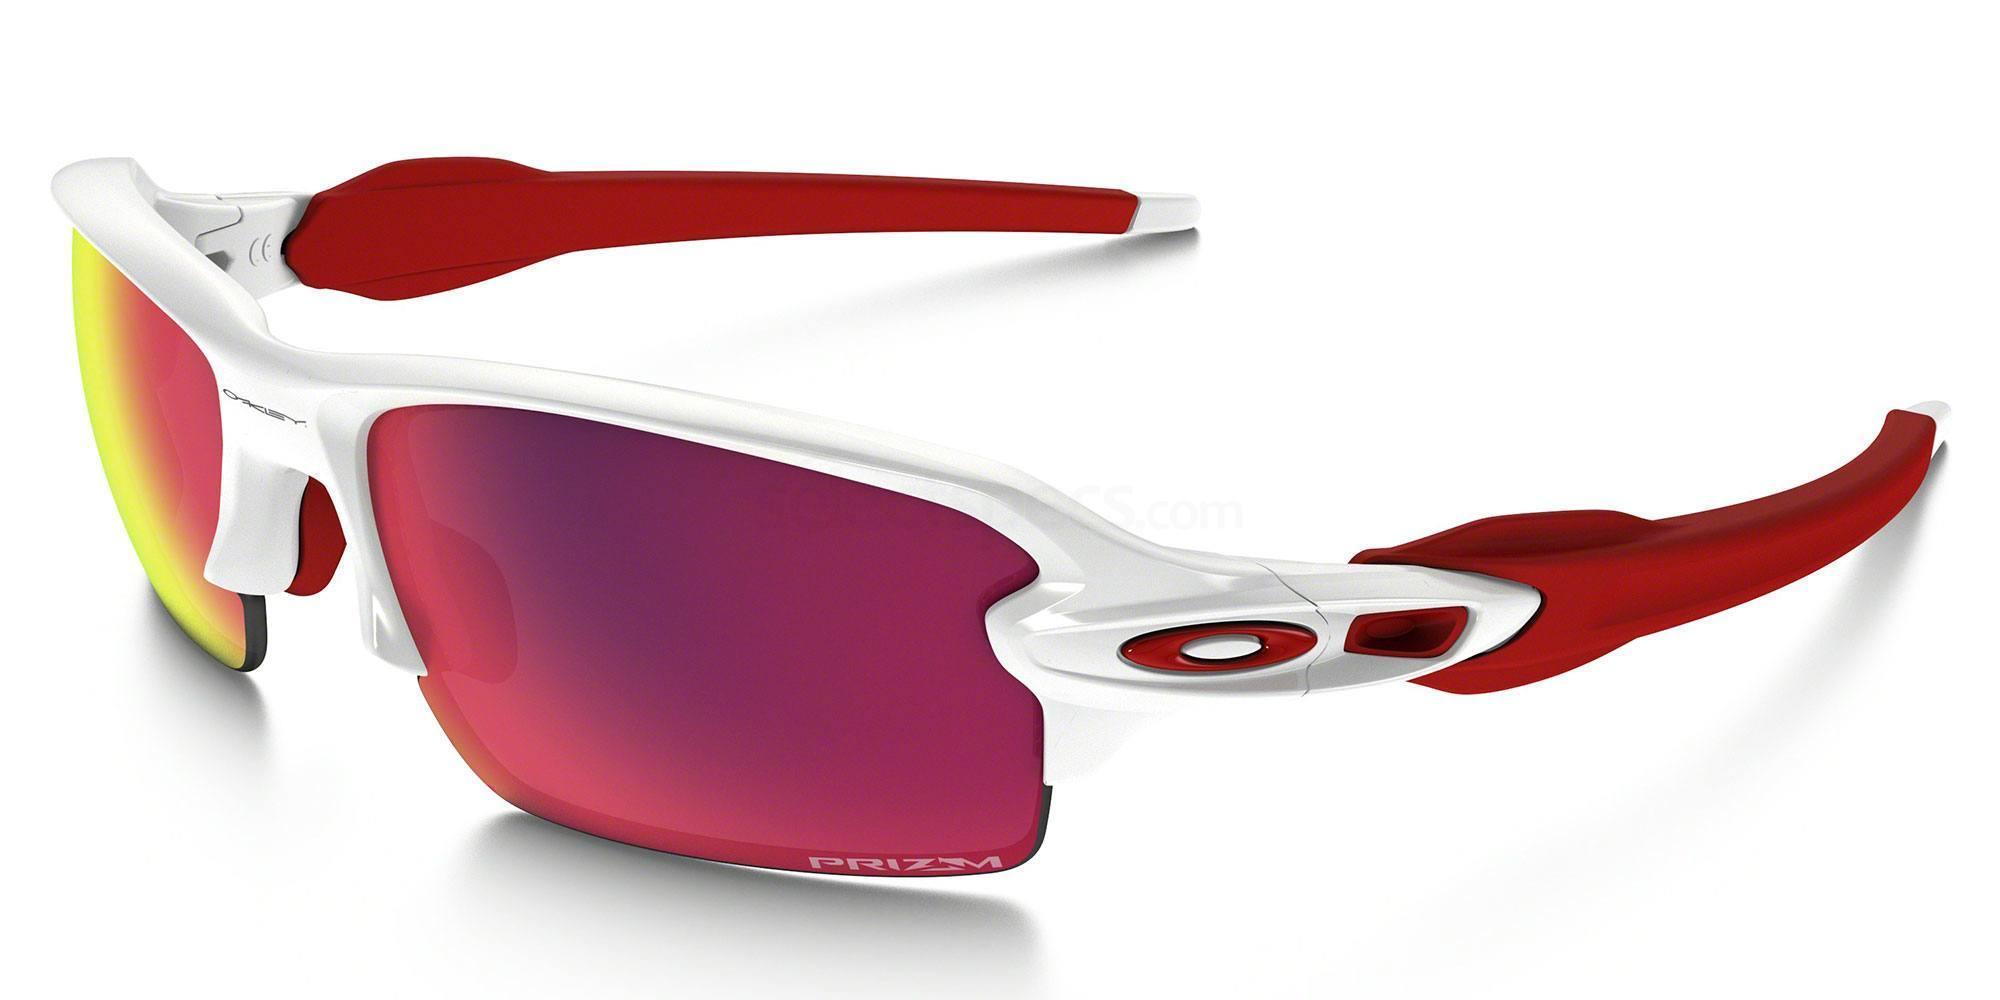 929505 OO9295 PRIZM ROAD FLAK 2.0 Sunglasses, Oakley